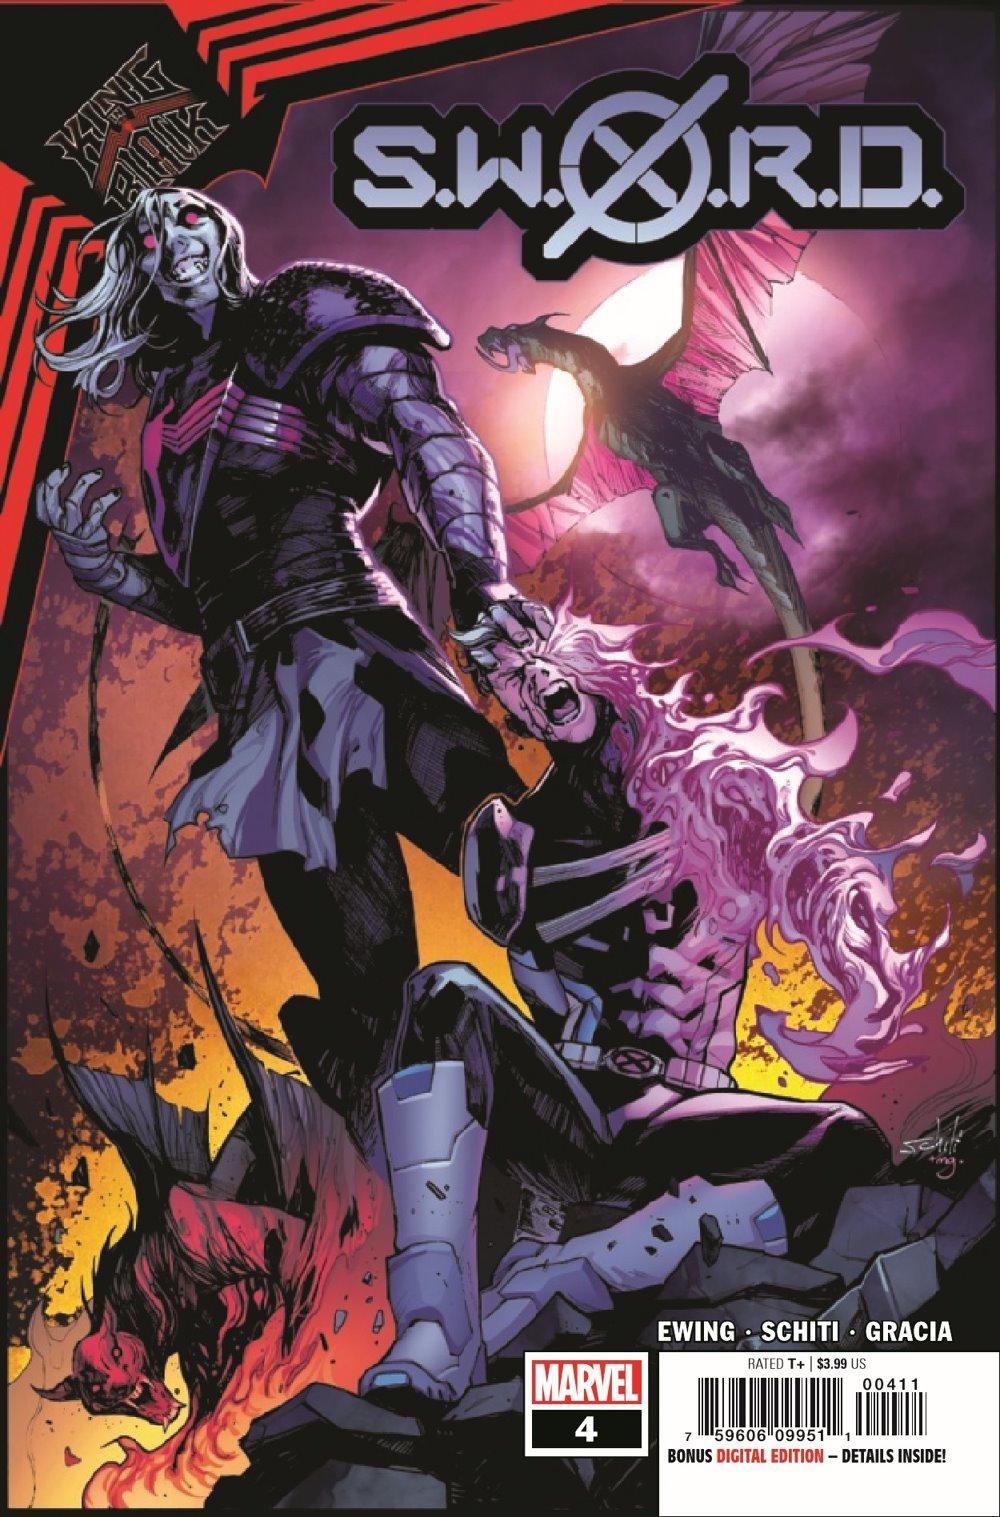 SWORD2020004_Preview-1 ComicList Previews: S.W.O.R.D. #4